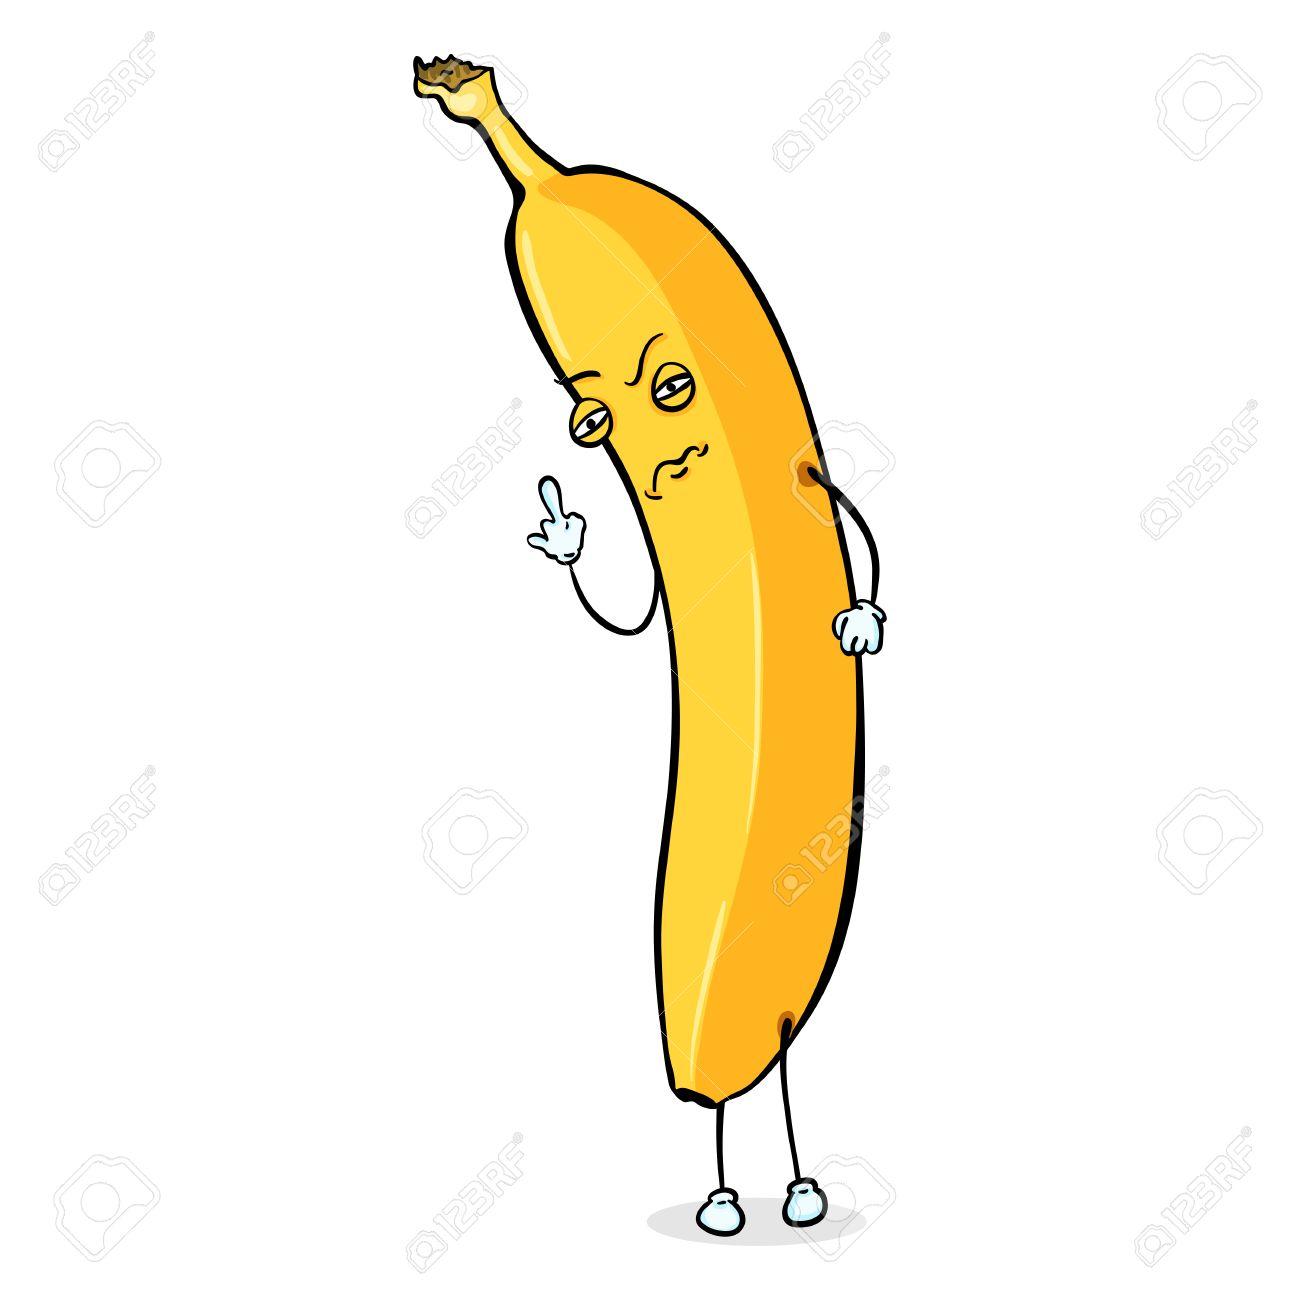 Carácter Vectorial De Dibujos Animados Falta De Respeto Plátano Hombre Amarillo Plátano